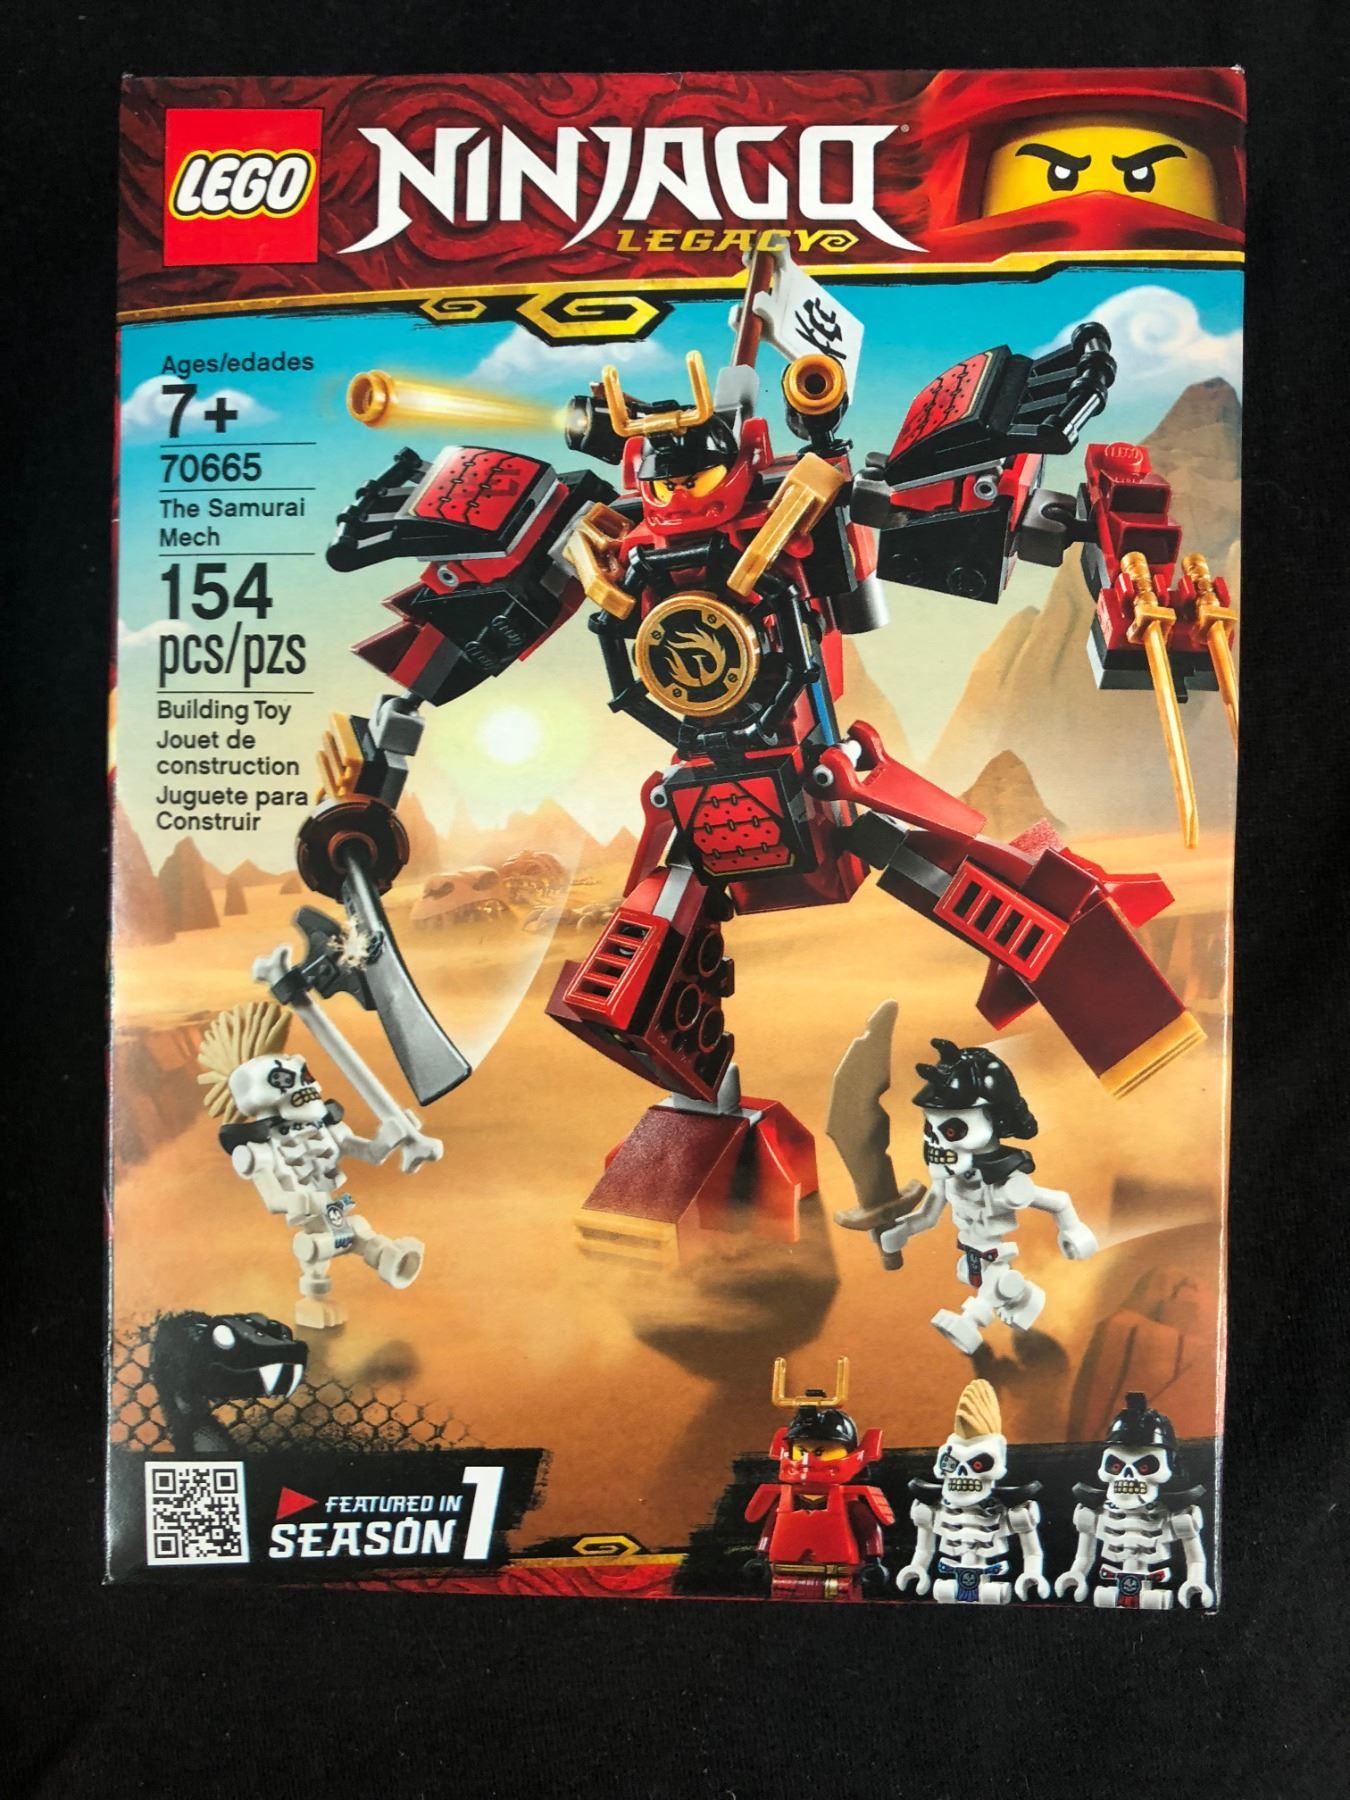 Samurai Legacy Mech 70665 Ninjago The Lego 2EDH9I